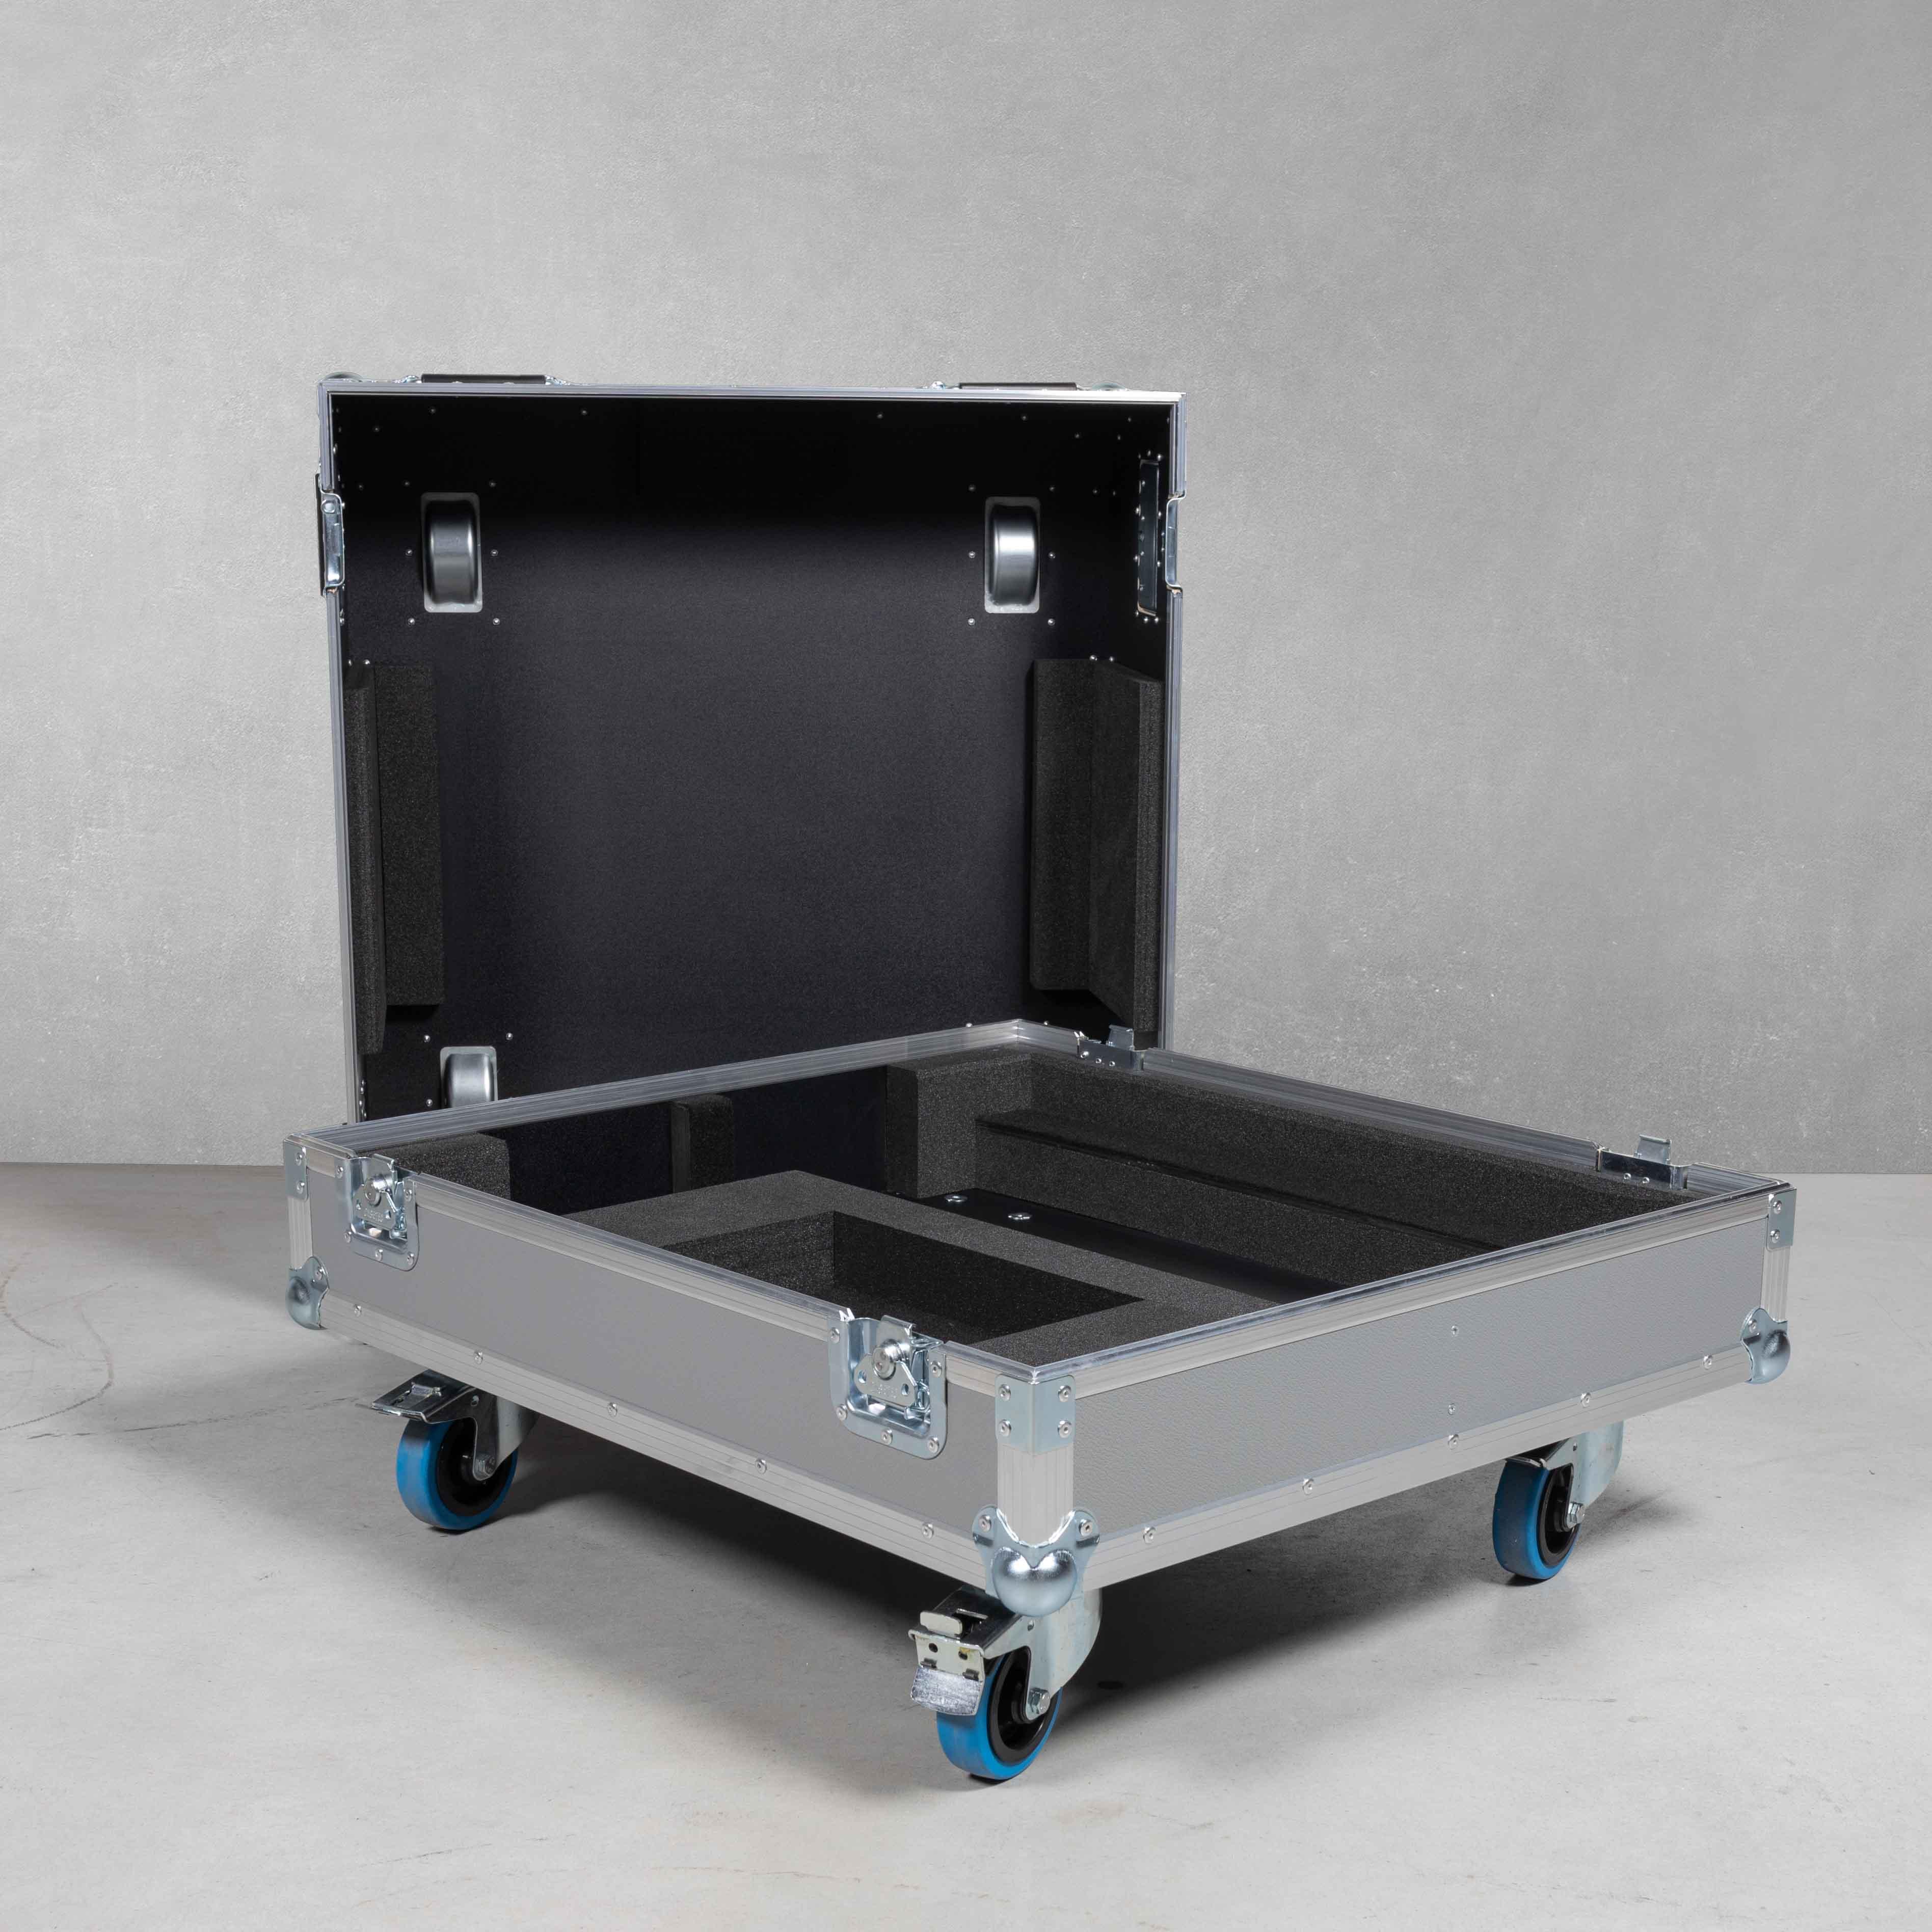 Haubencase Epson EB-L1000 Serie Projektoren mit Frame ELPMB50 (Epson Nepal) / EVO Frame E10 oder EVO Frame P10